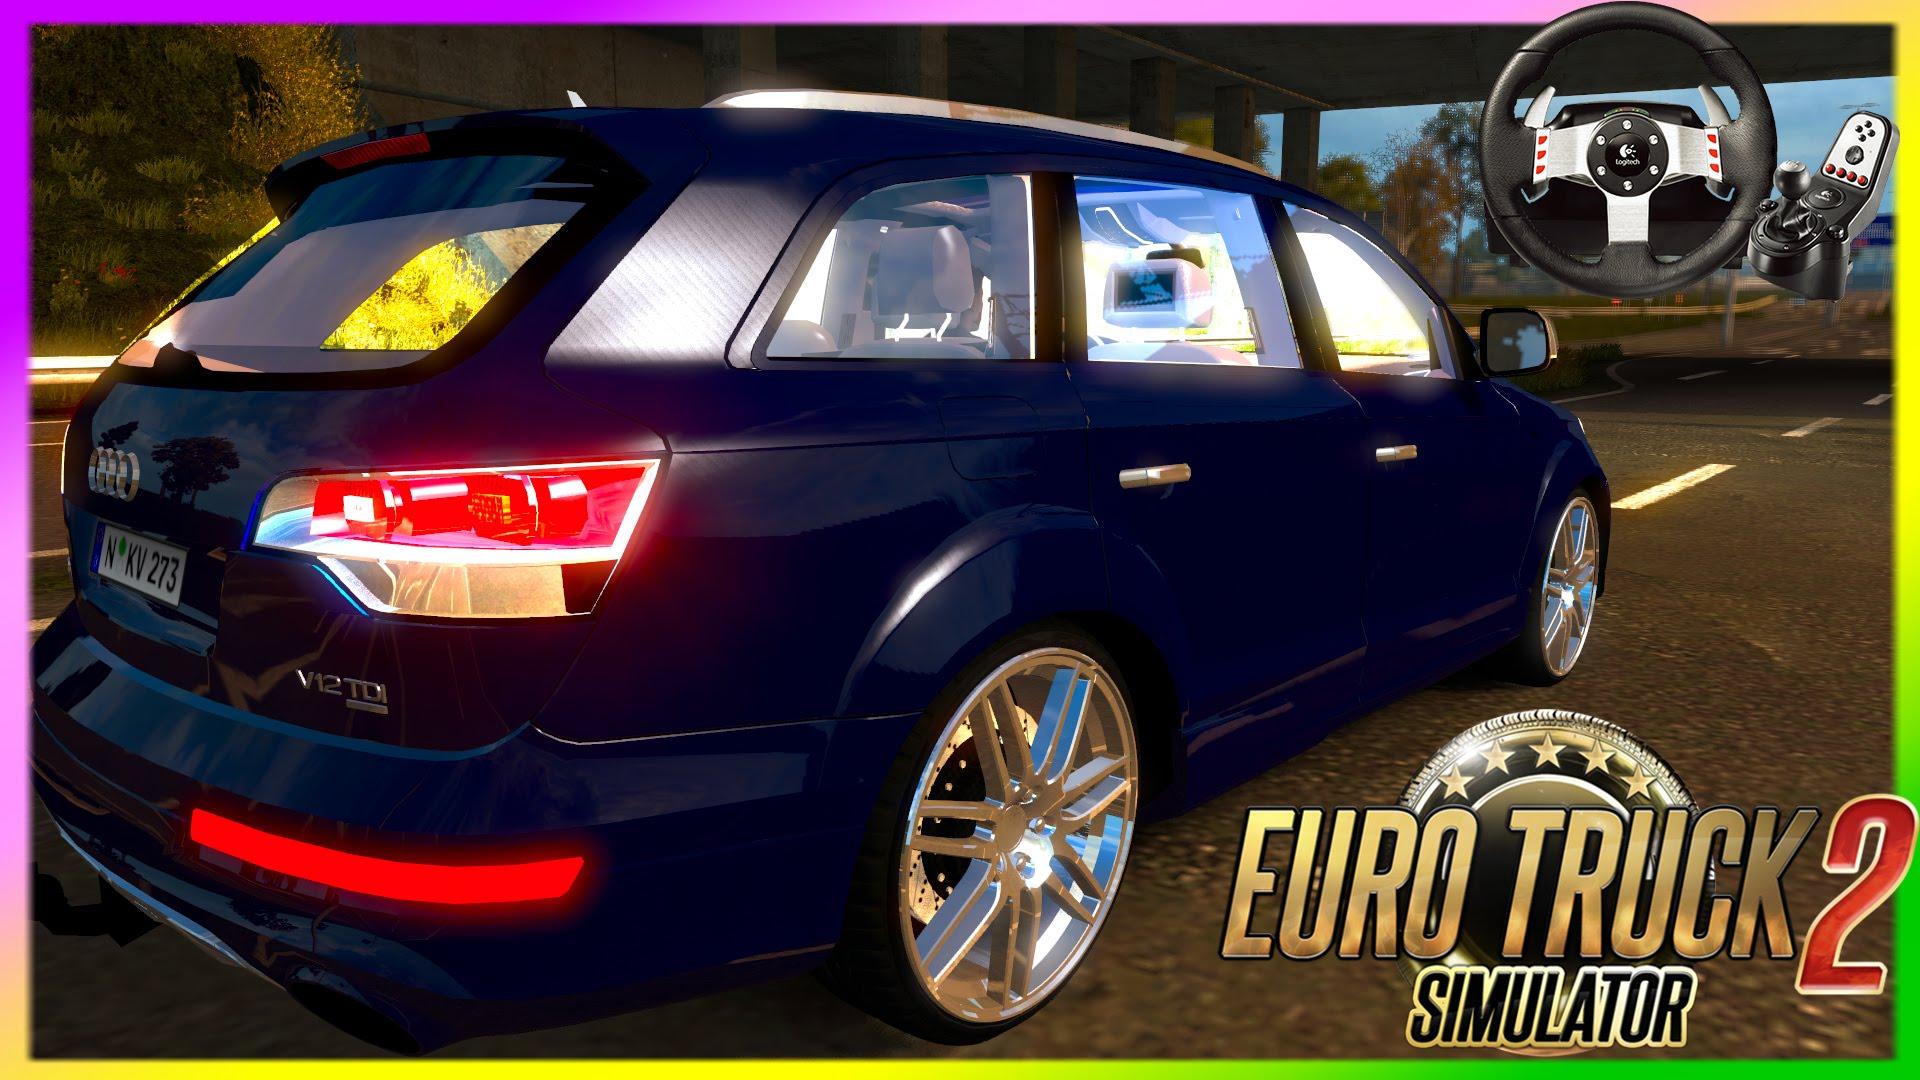 Audi Q7 Mod (Euro Truck Simulator 2)